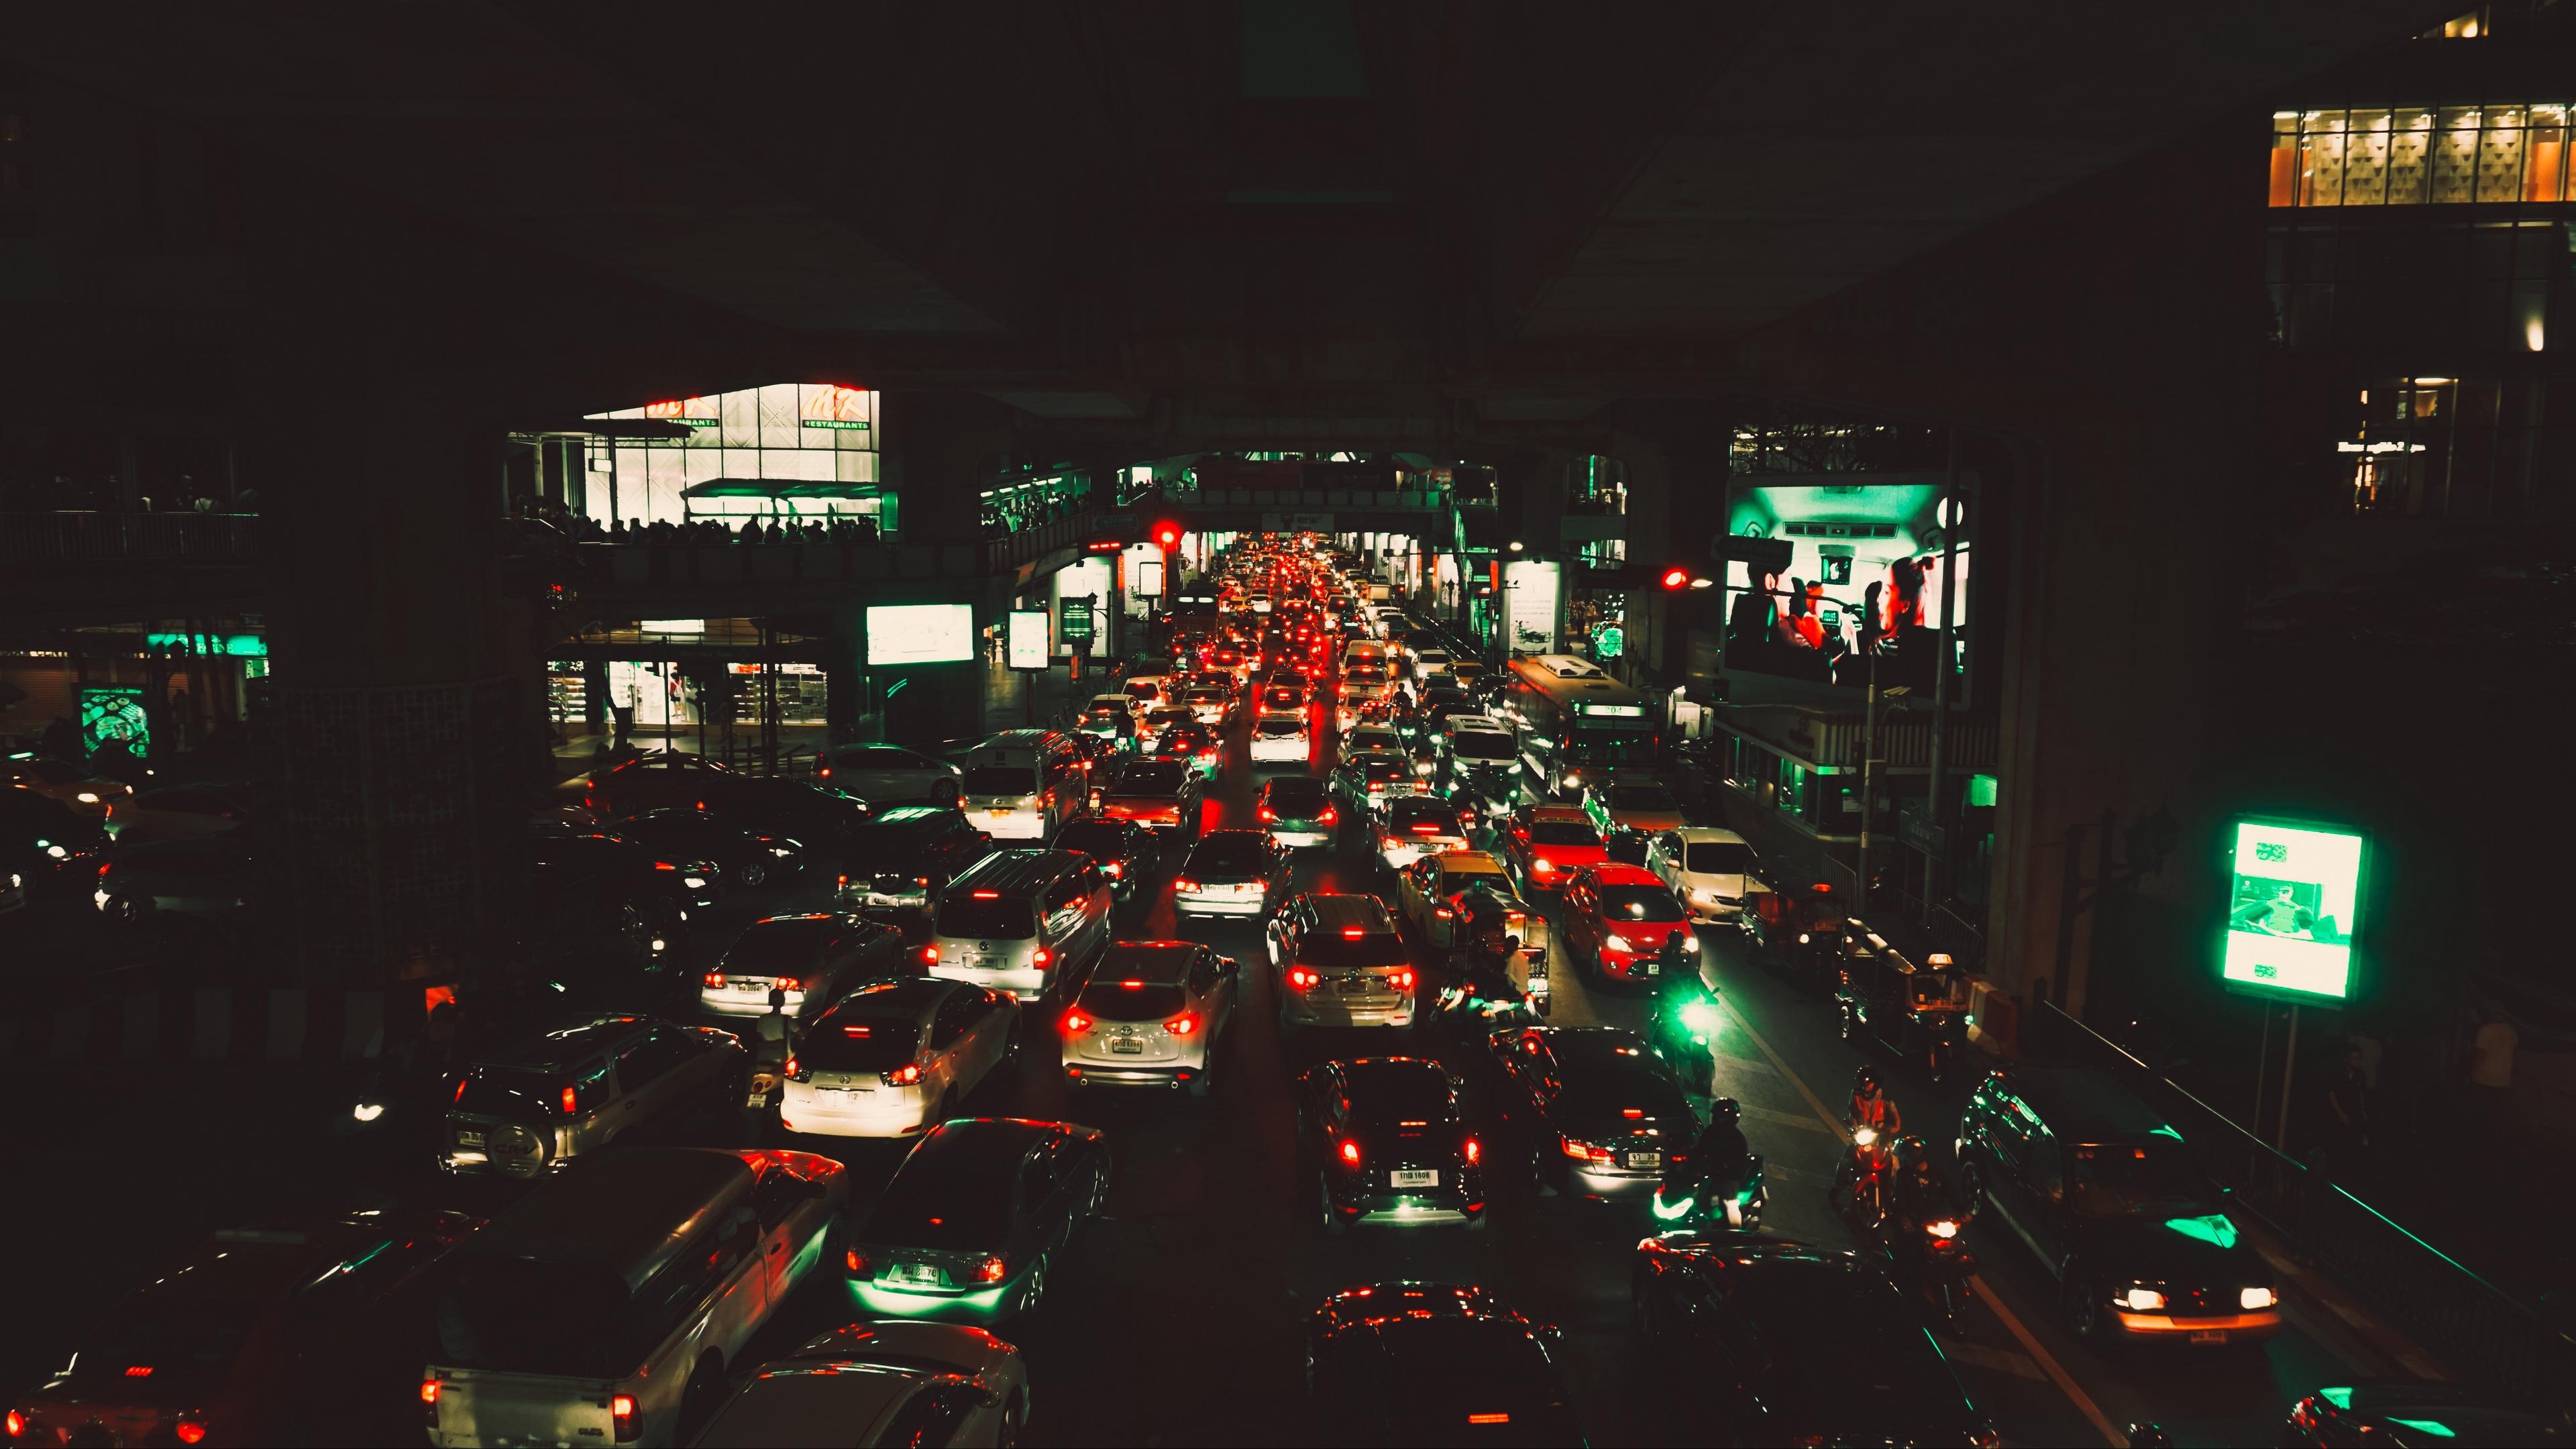 traffic bangkok siam metropolis 4k 1538066474 - traffic, bangkok, siam, metropolis 4k - Traffic, siam, bangkok